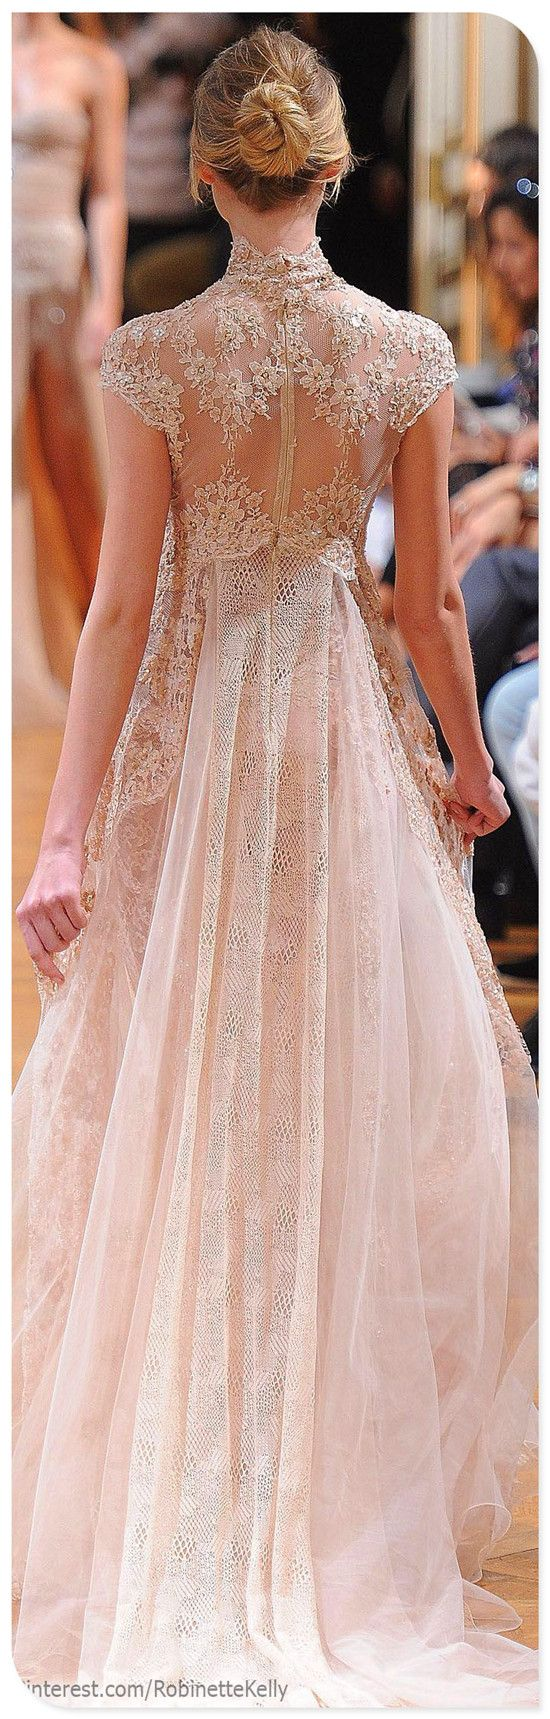 Mejores 117 imágenes de princess wedding dresses en Pinterest ...